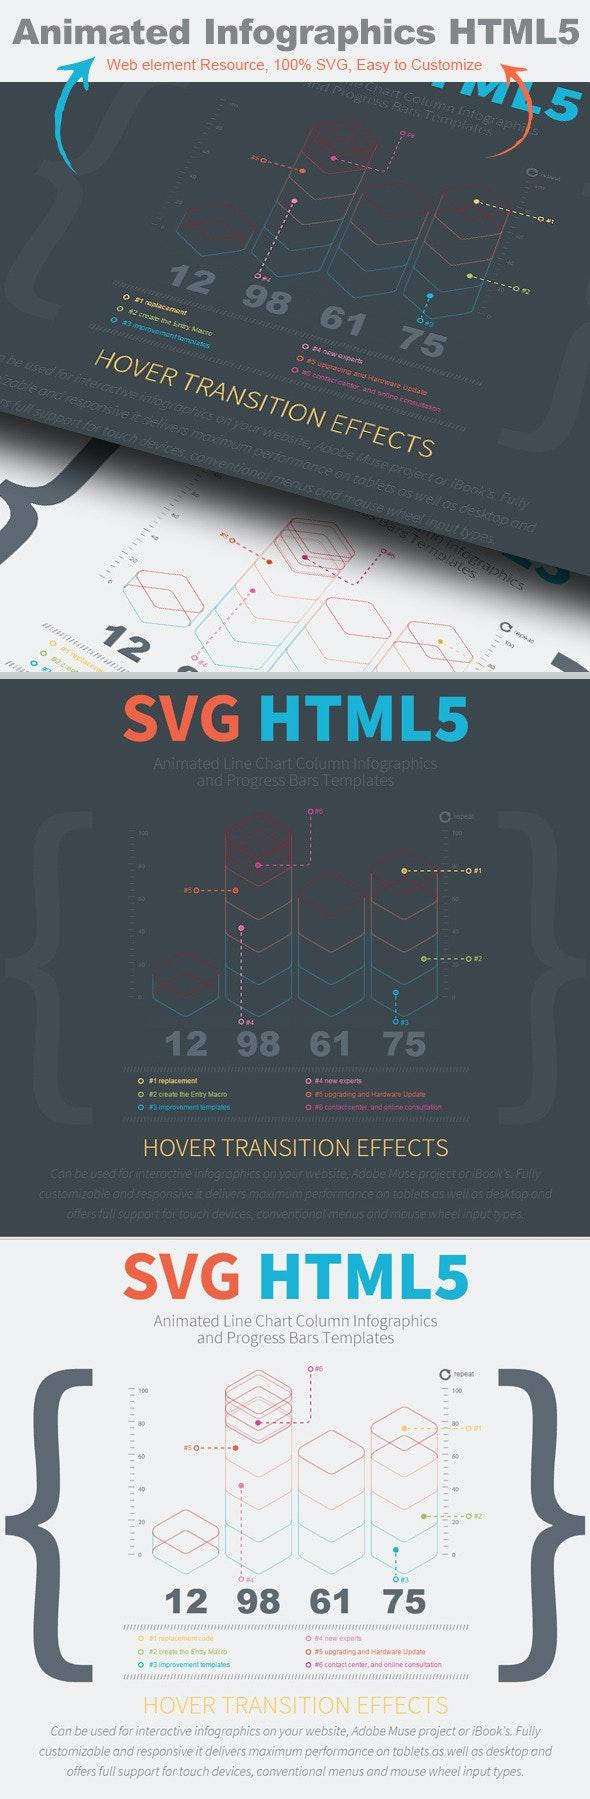 3D animated SVG Line Chart Column Infographics